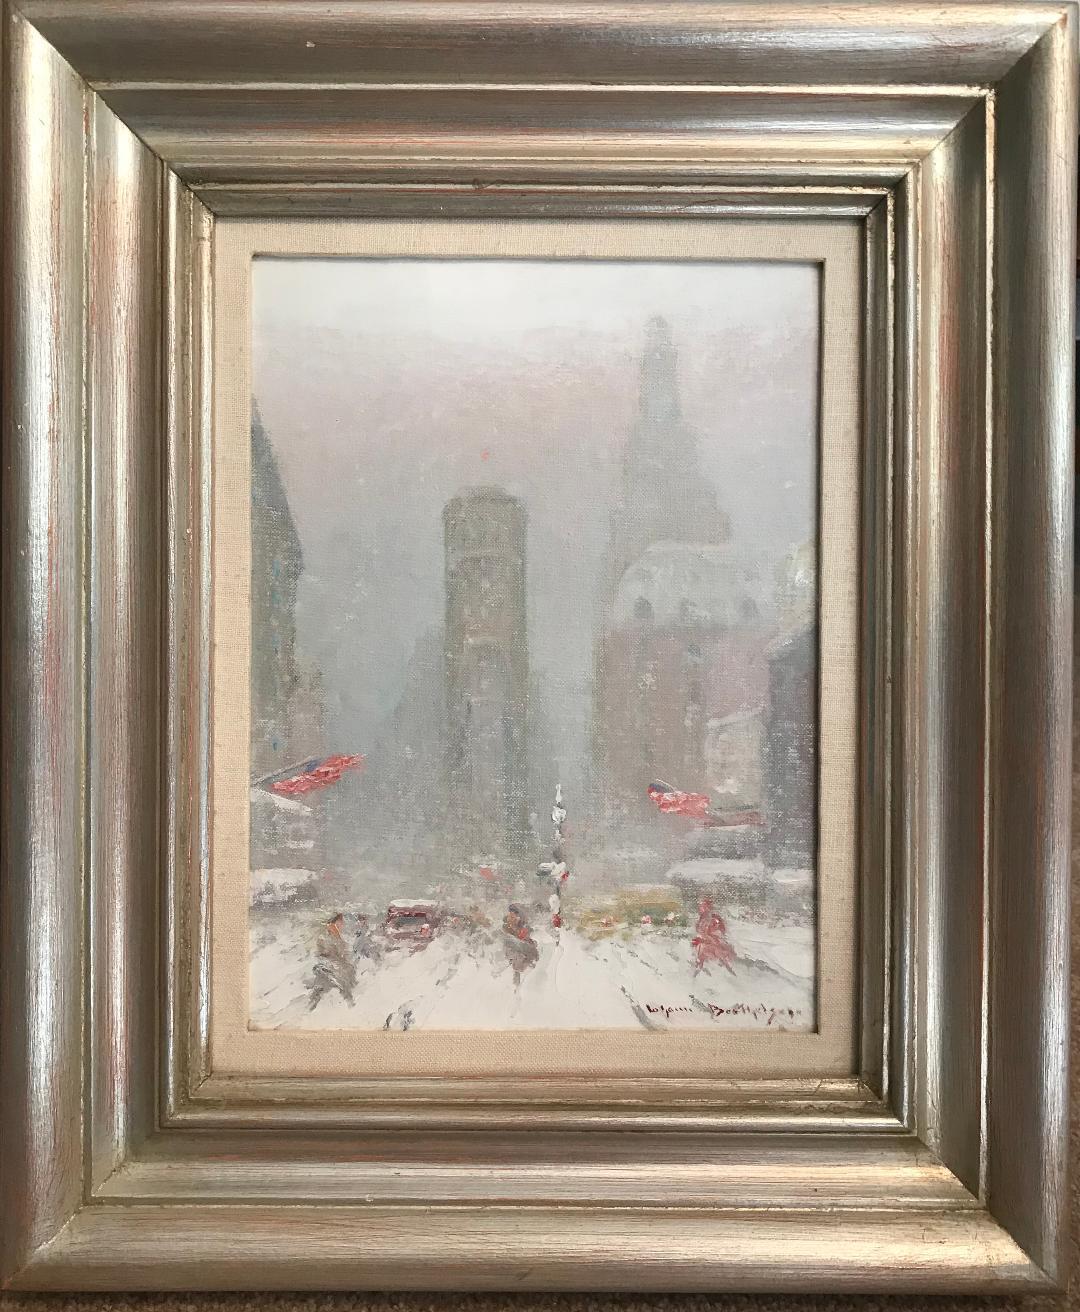 Johann Berthelsen, Times Sq, Period Oil Painting of New York City 1883-1972